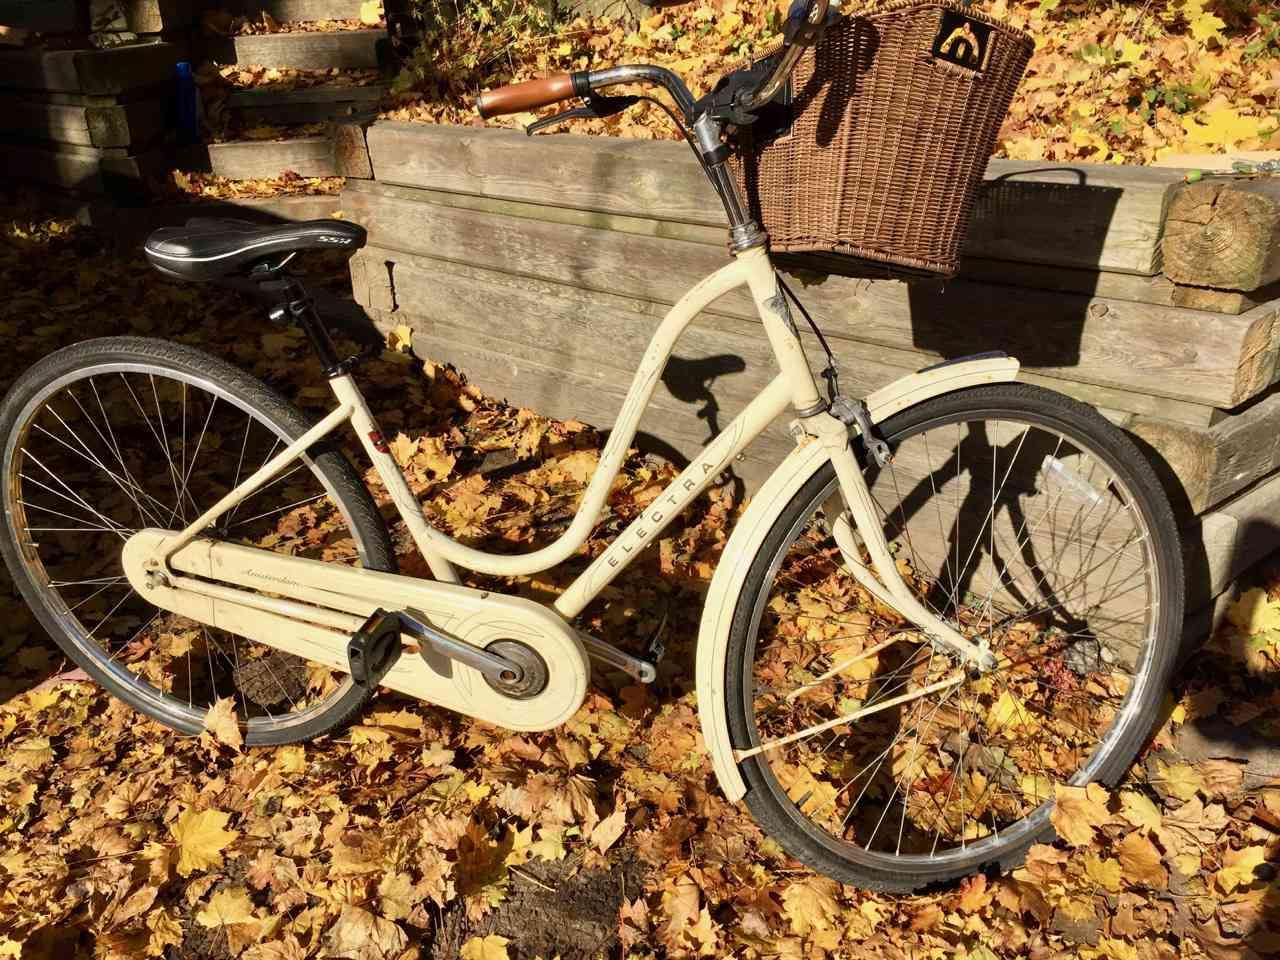 My daughter's Dutch Bike